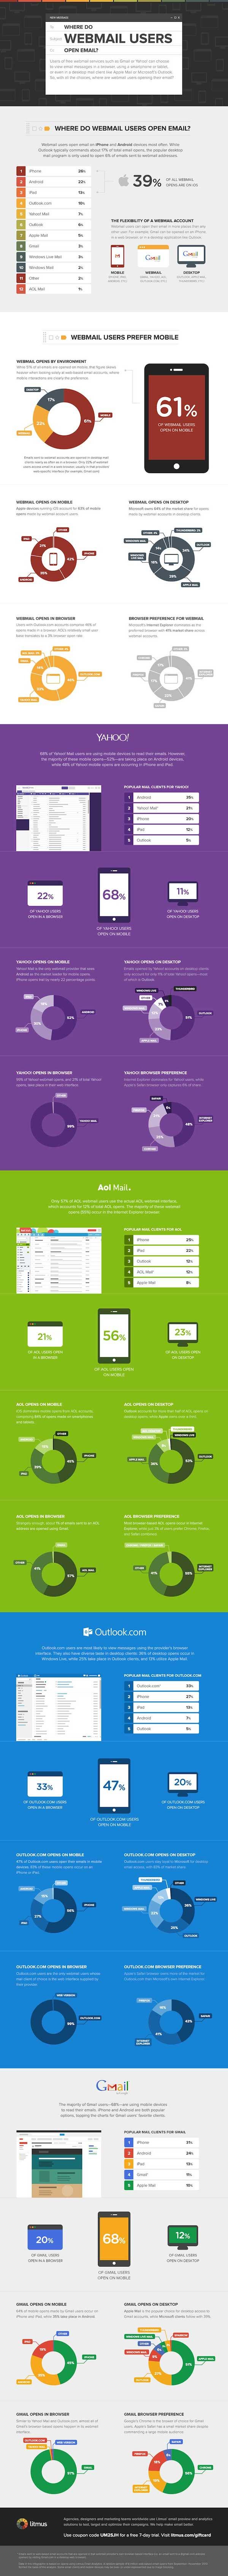 mobile-email-marketing-statistics